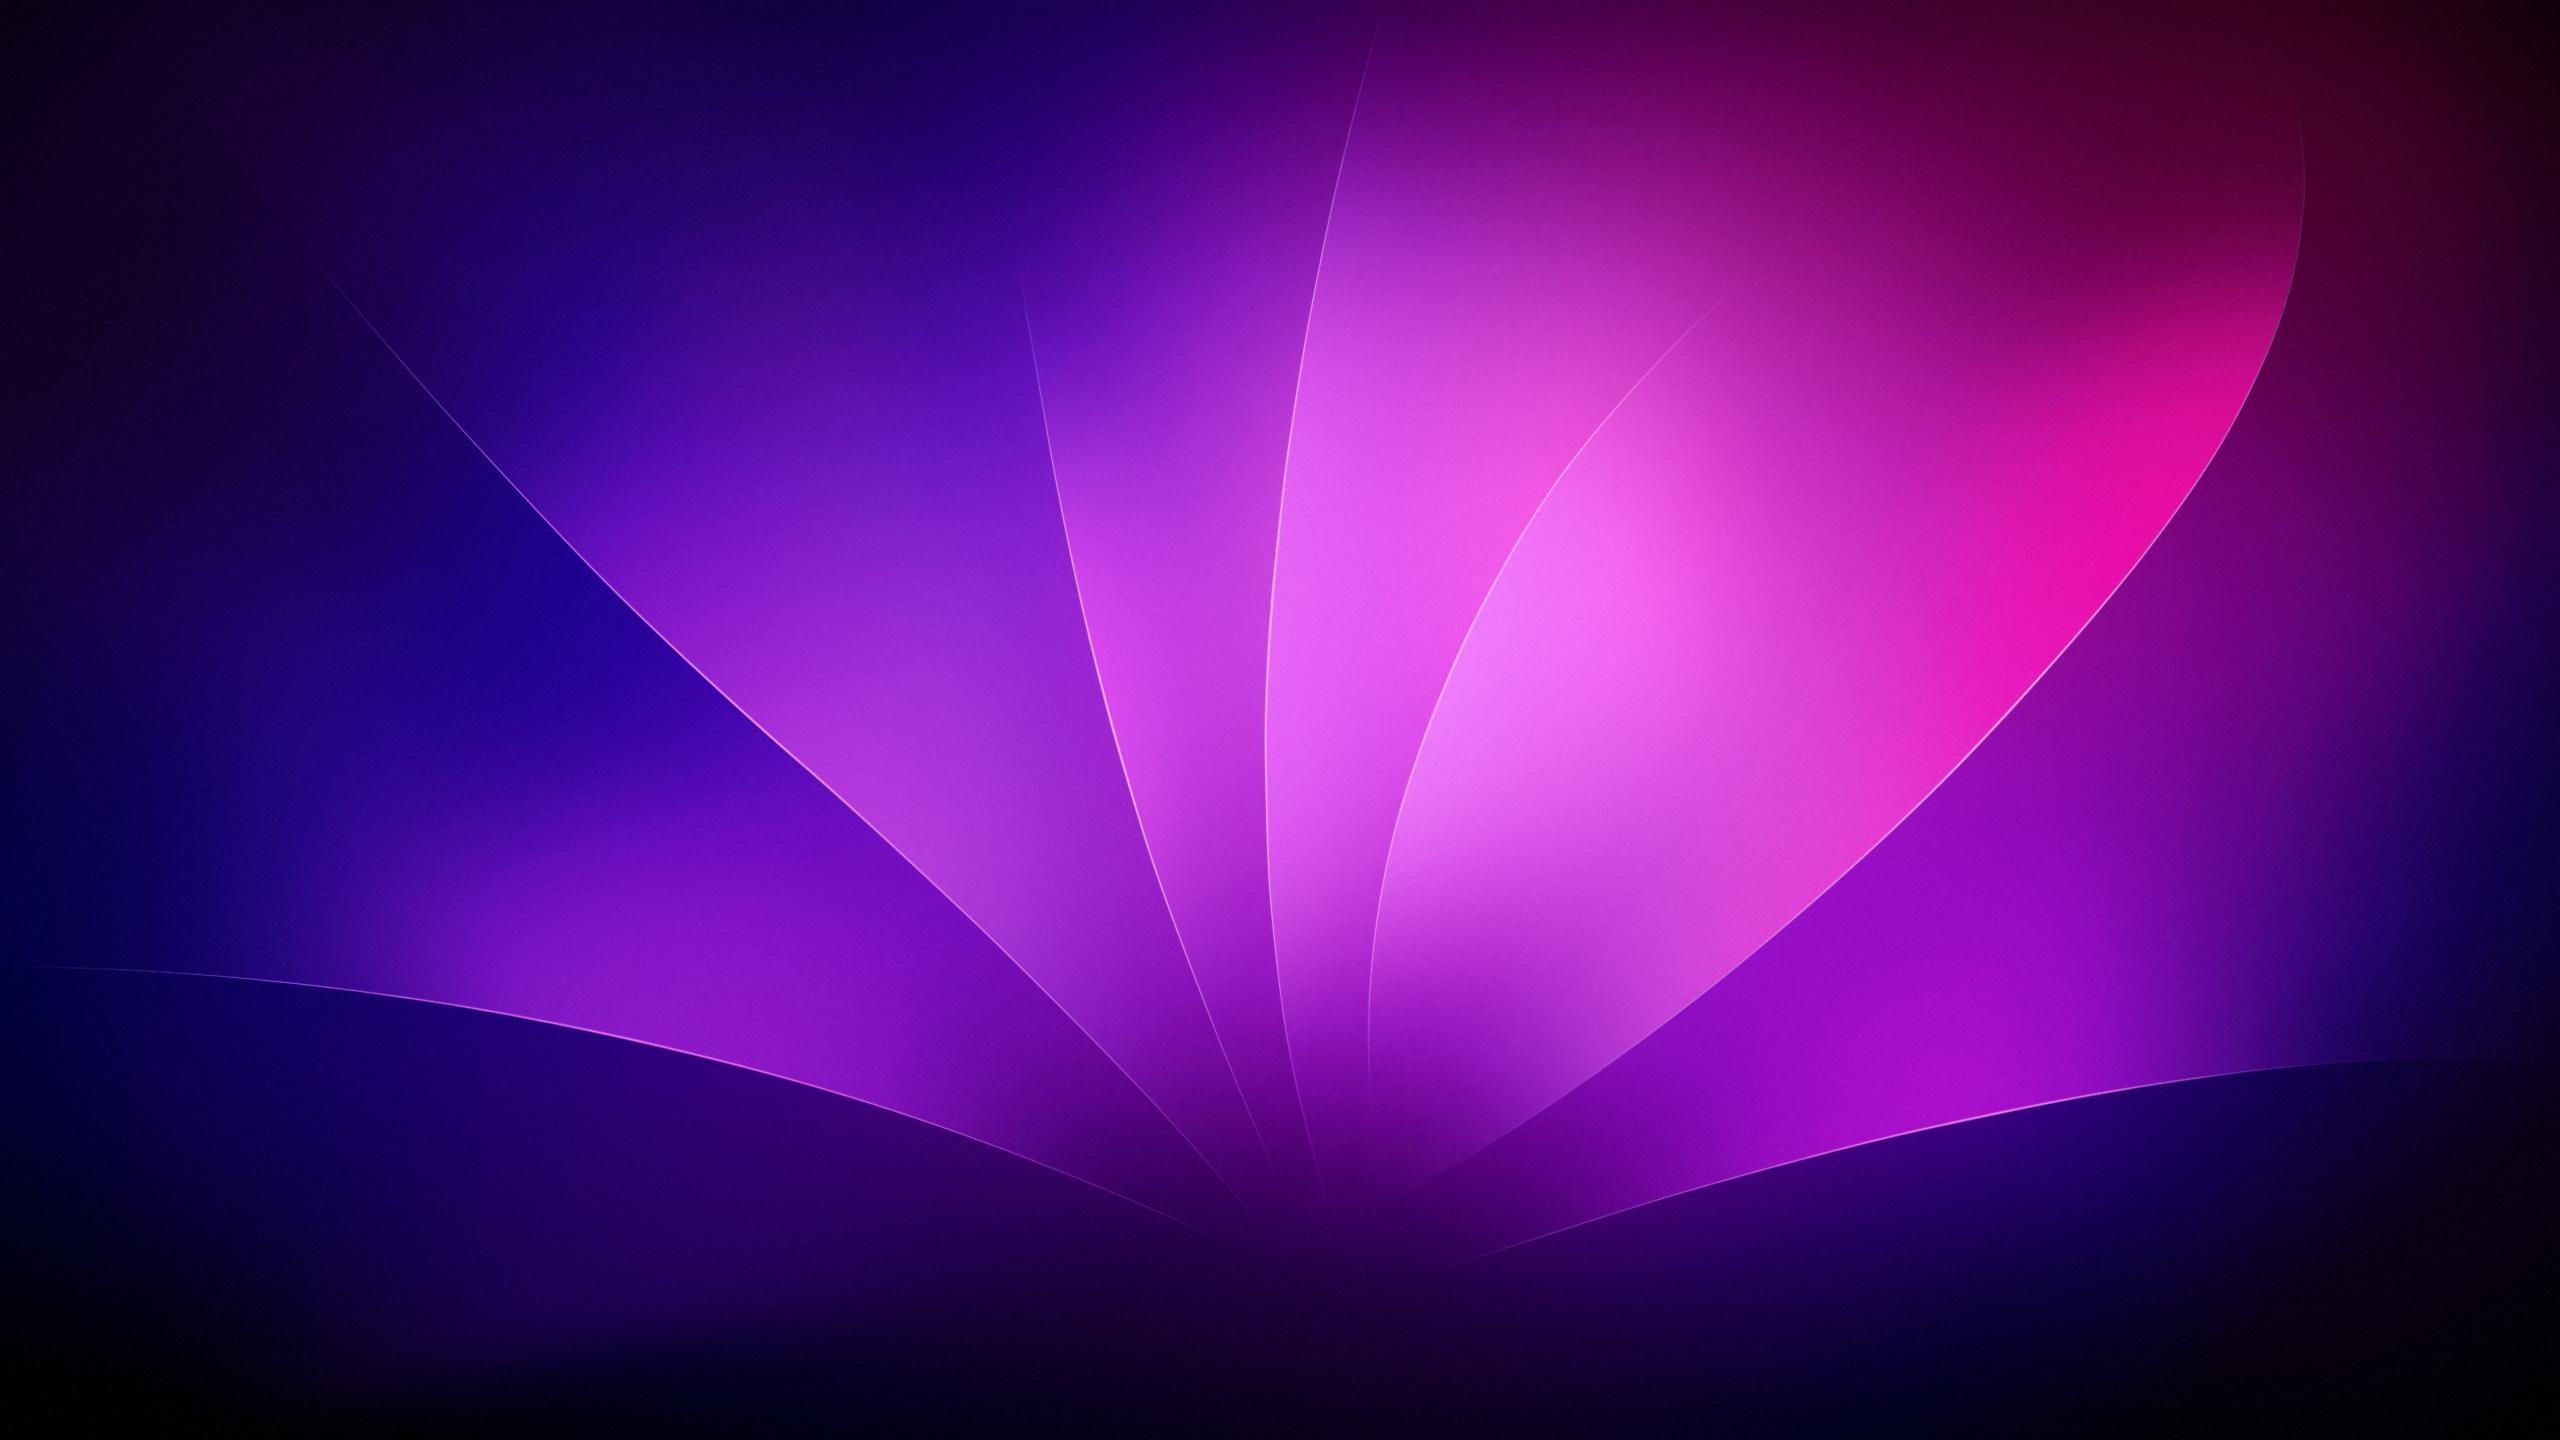 Mac OS X Snow Leopard Wallpaper Download | HD Wallpapers | Pinterest |  Leopard wallpaper, Hd wallpaper and Wallpaper